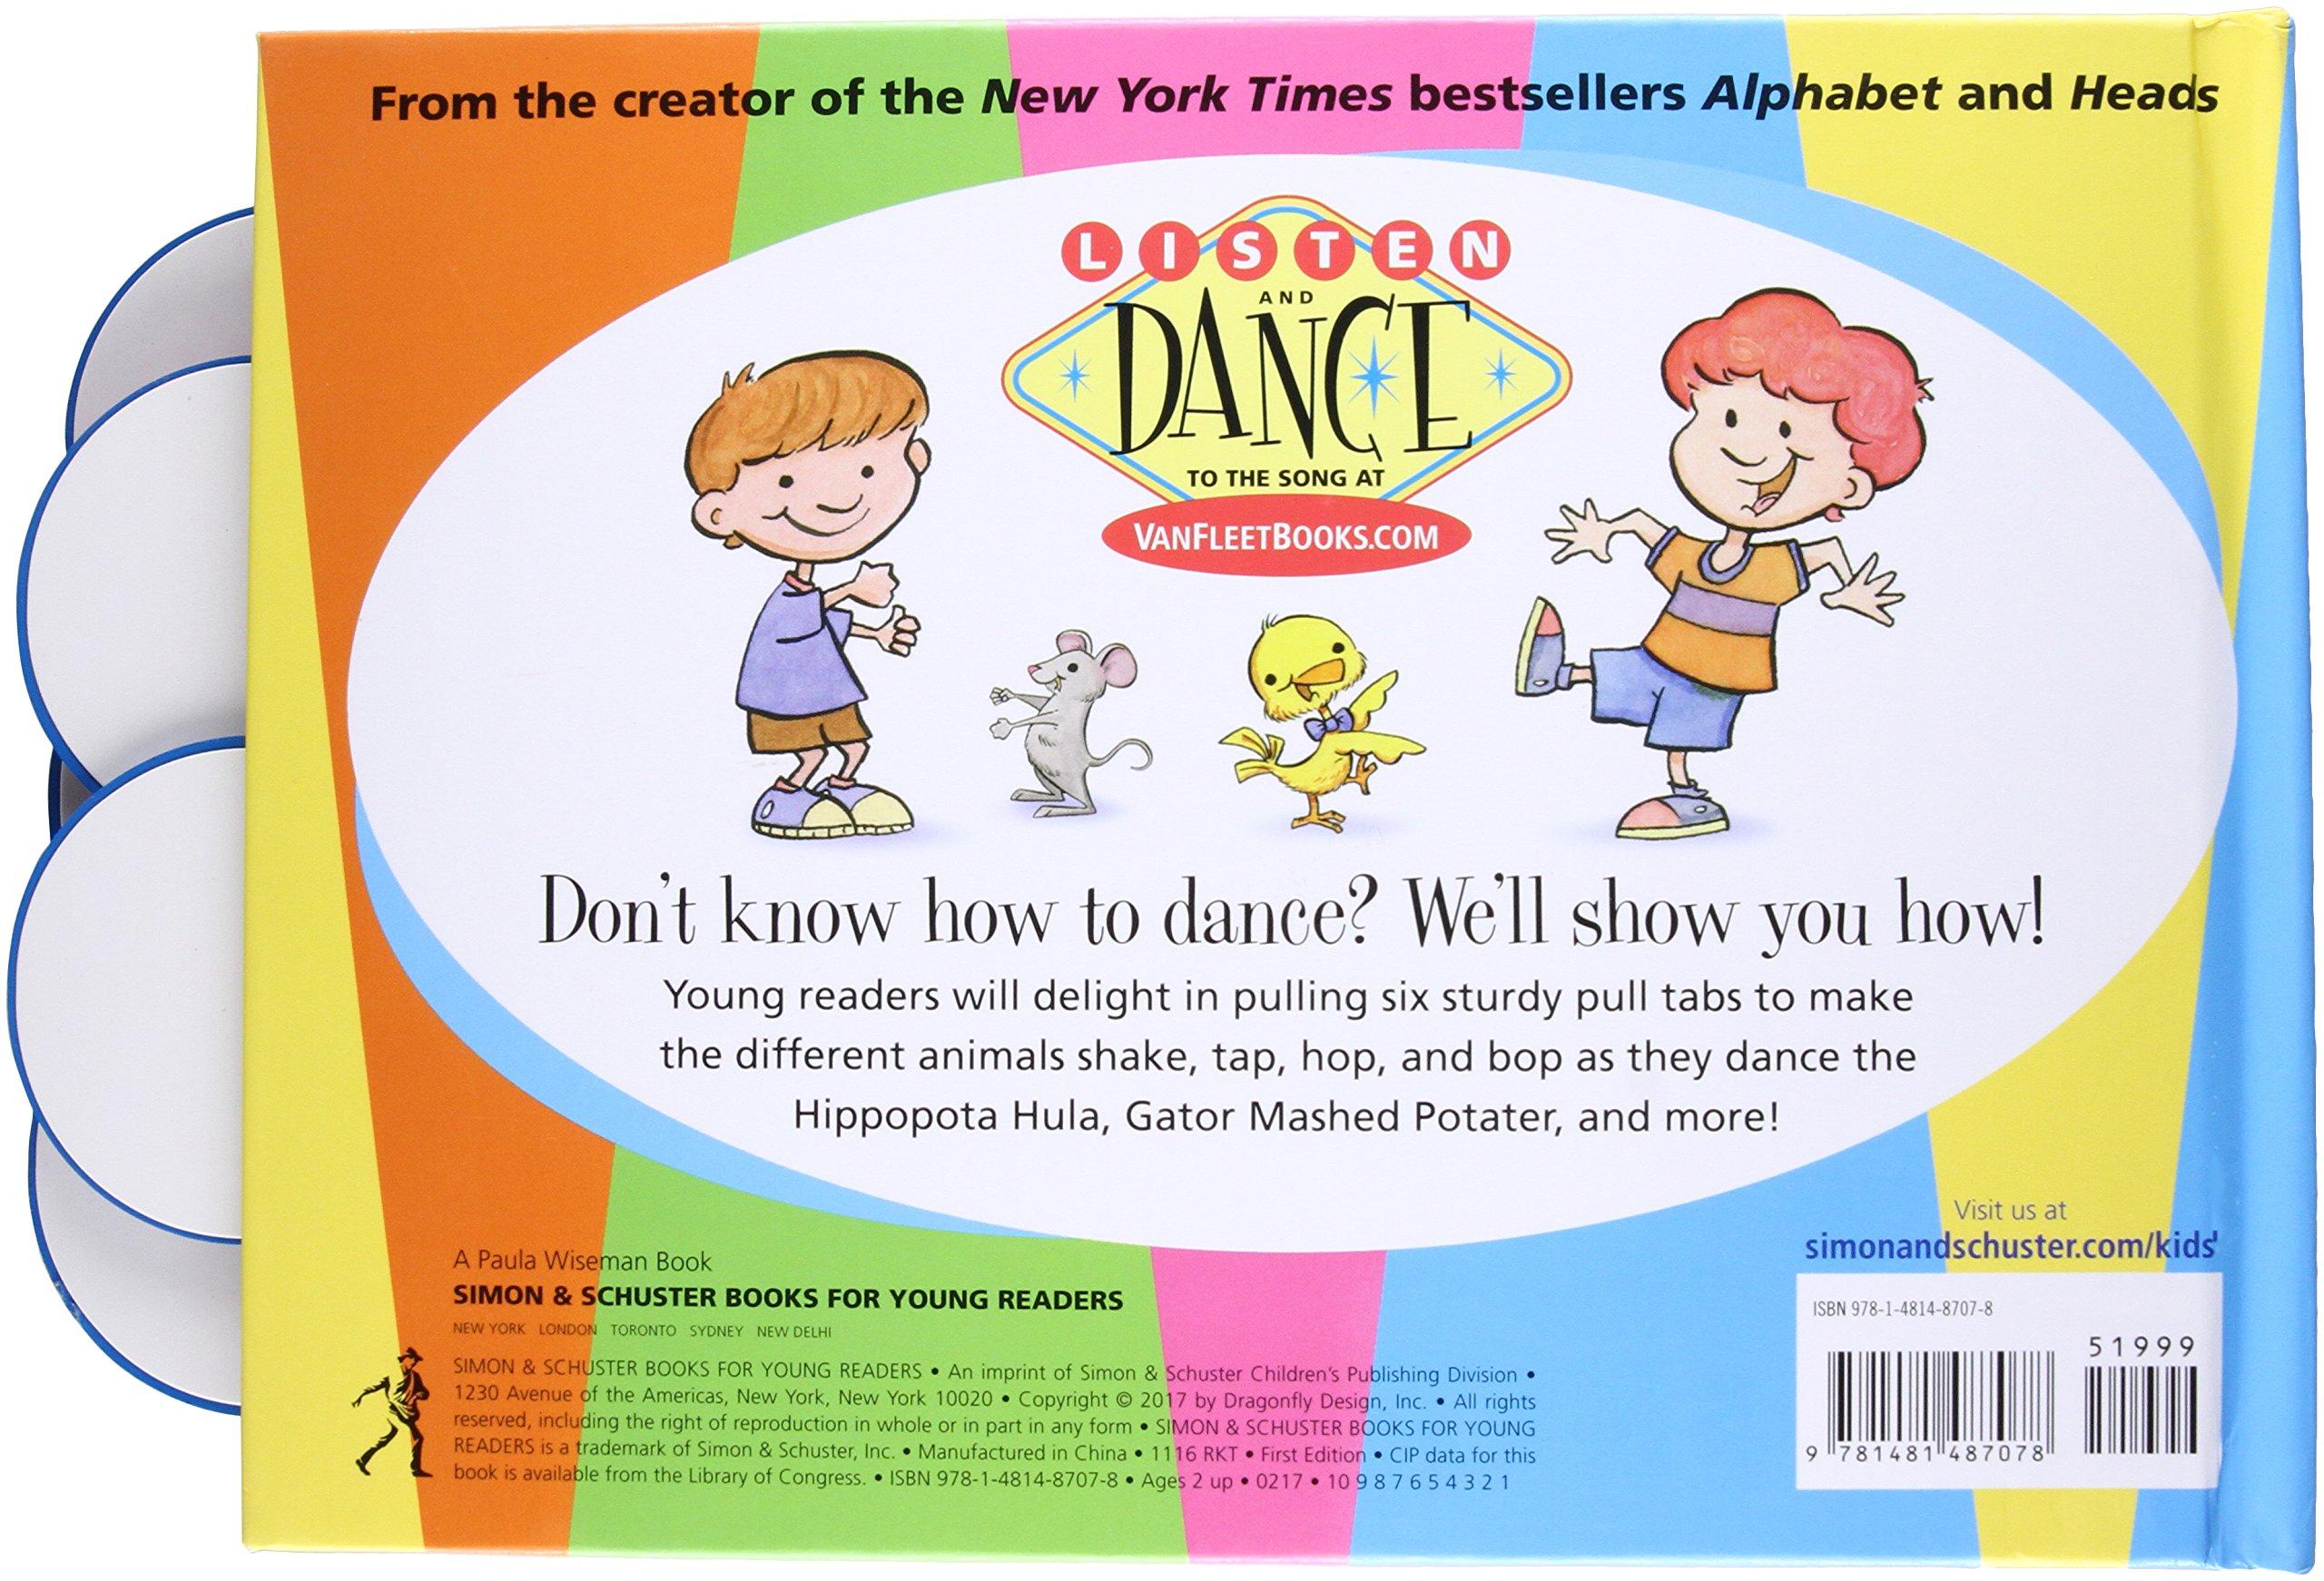 Dance by Simon Schuster Paula Wiseman Books (Image #2)